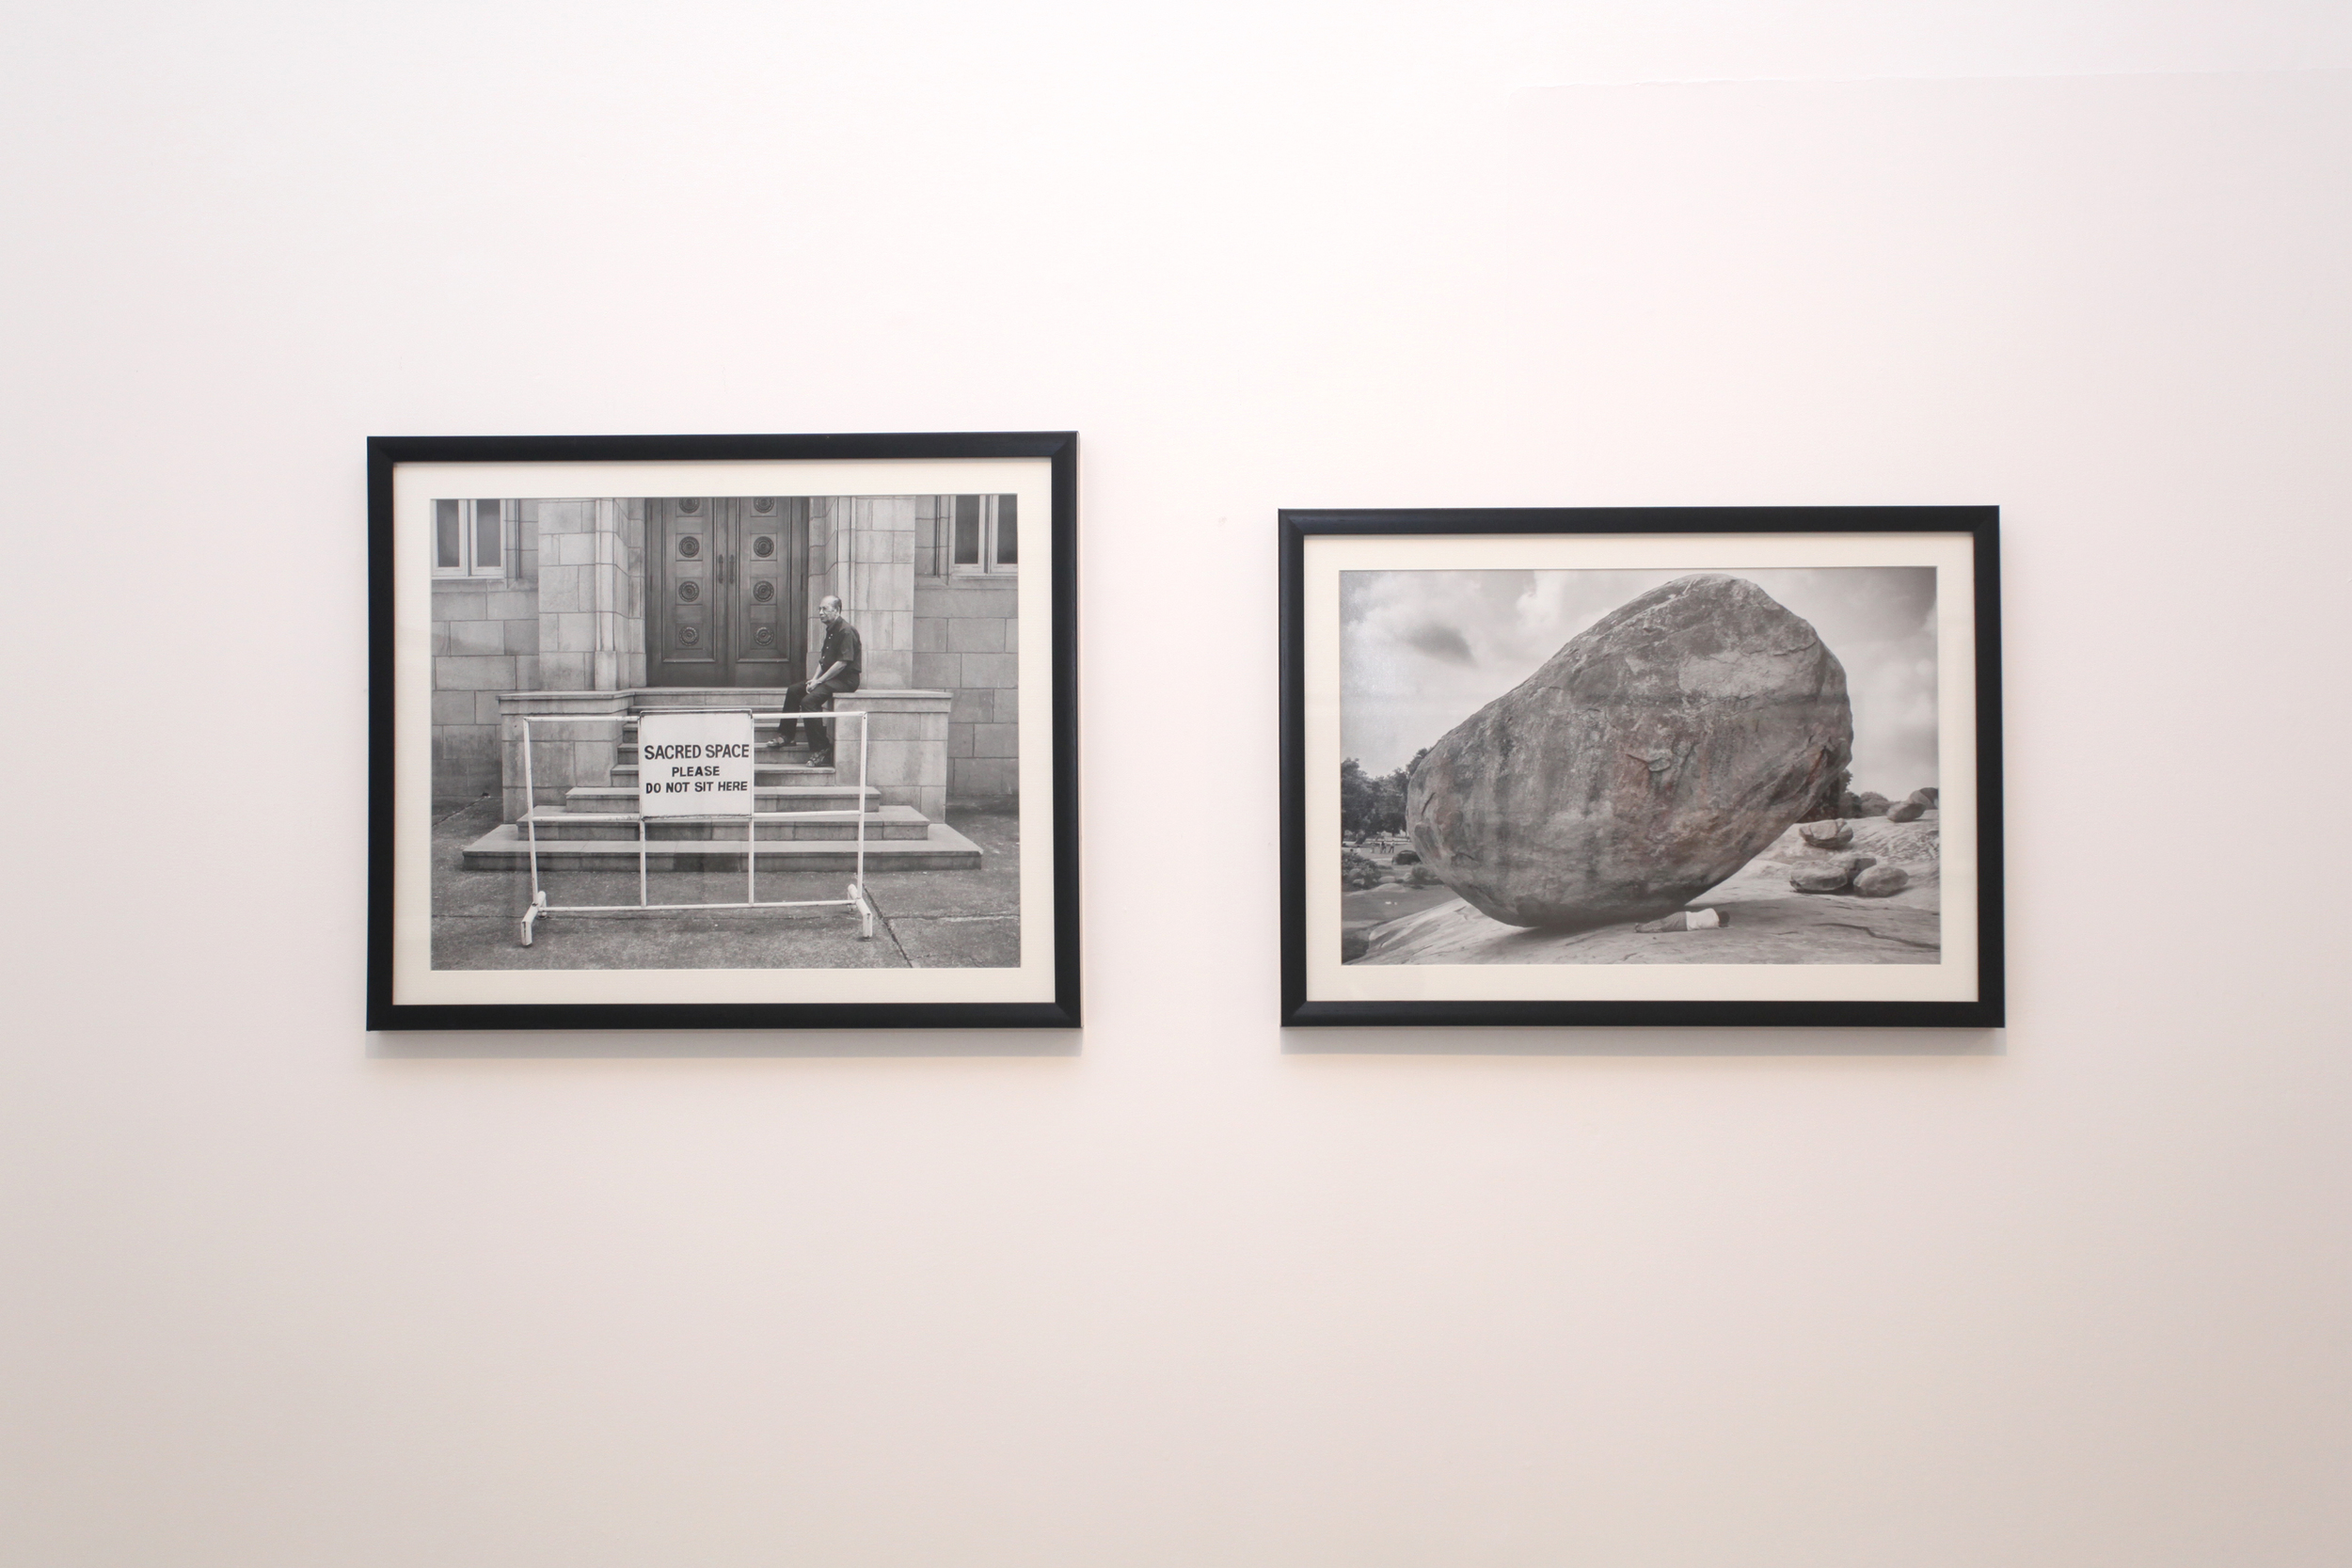 008-Naveen Munjal &  Craig Semetko .JPG